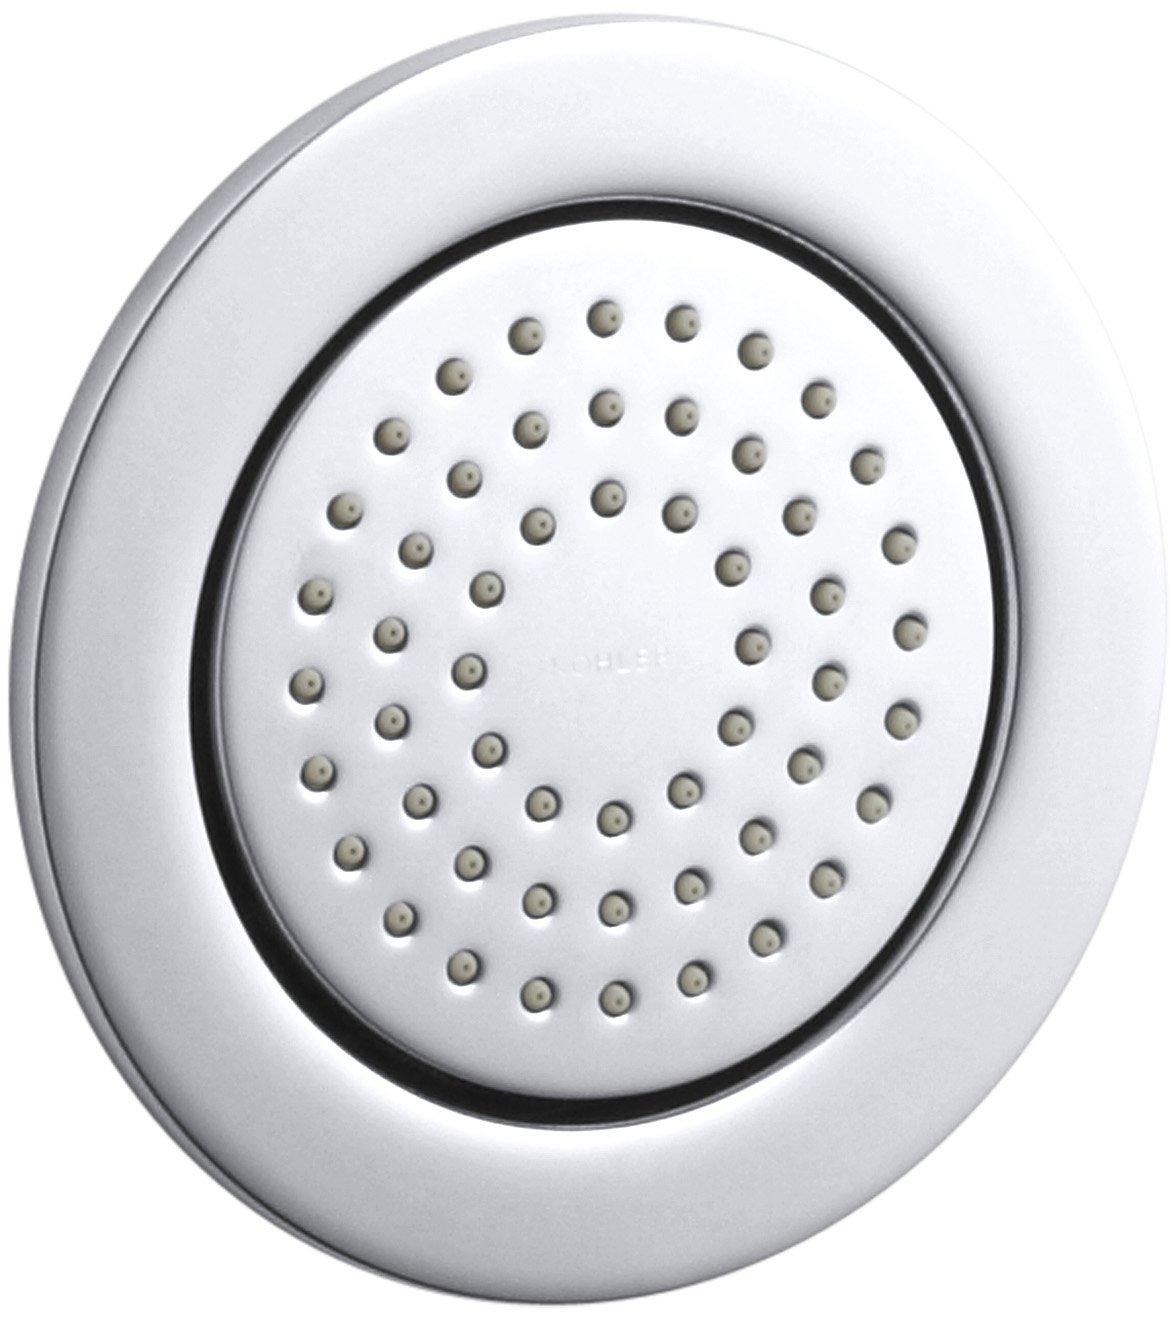 KOHLER K-8014-CP WaterTile Round 54-Nozzle Body Spray, Polished Chrome